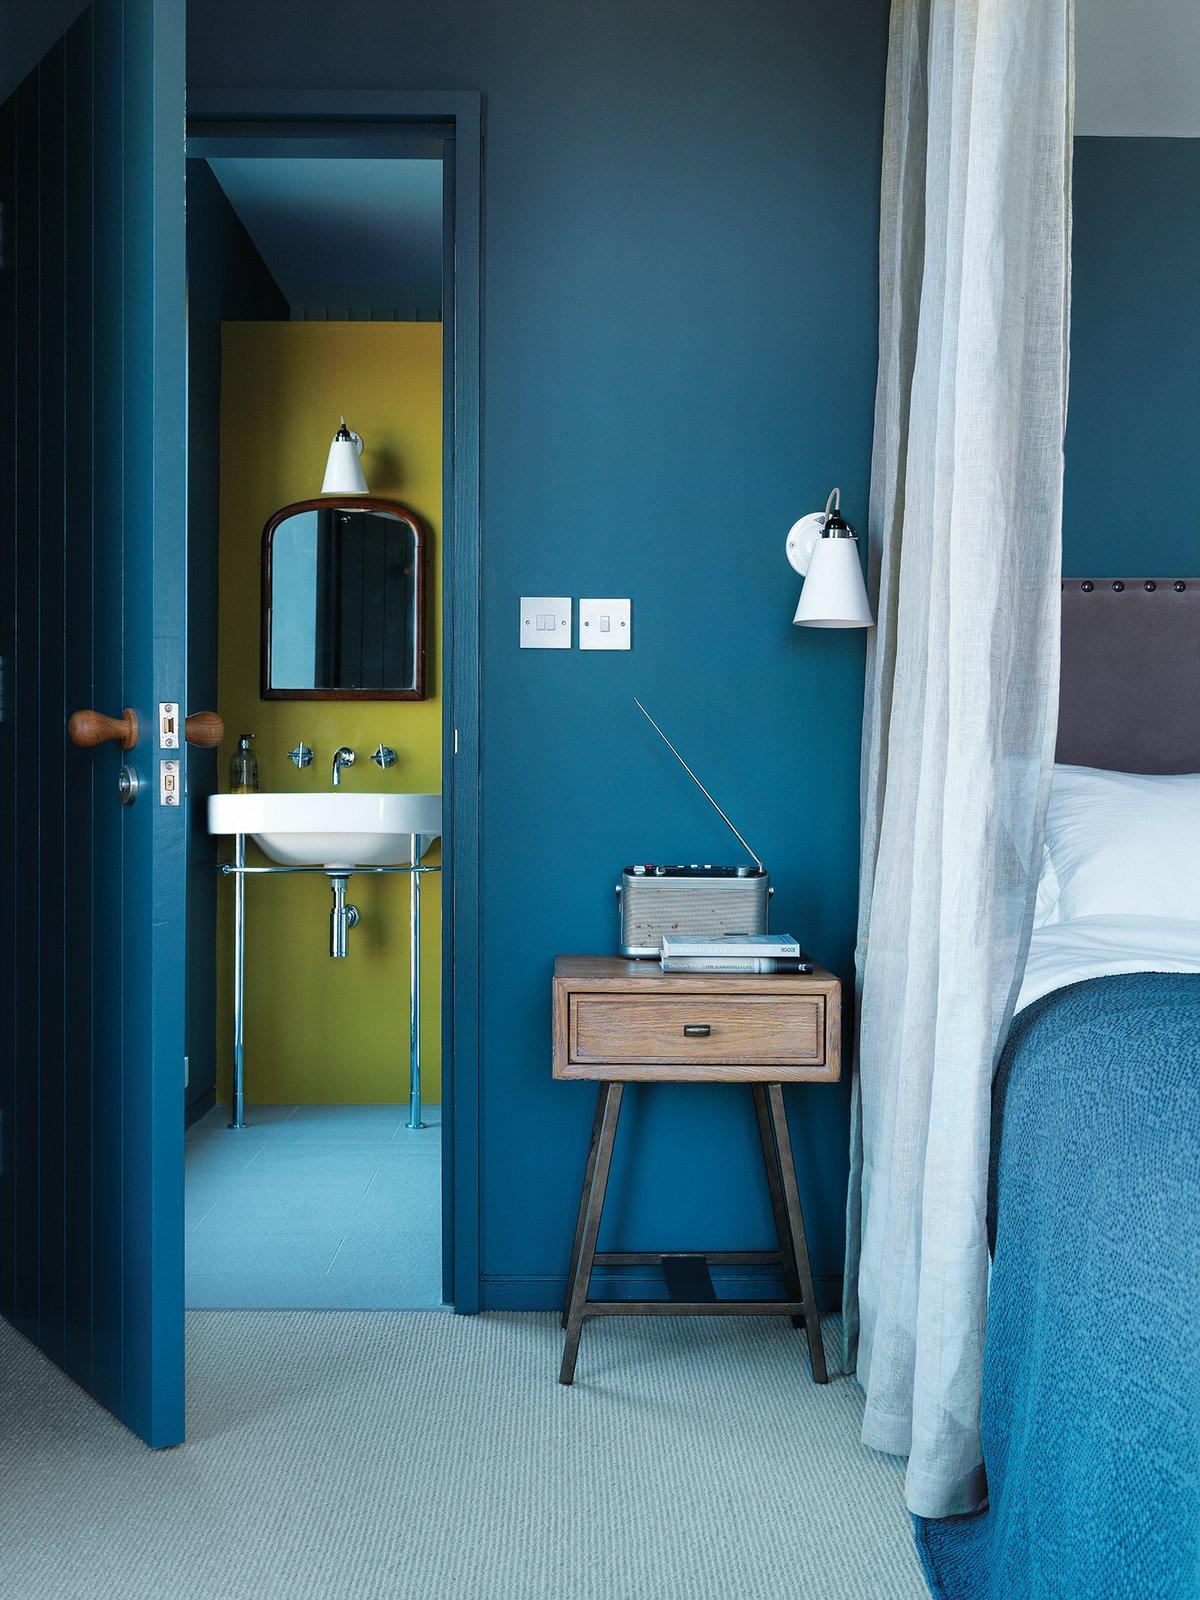 #color #blue #bedroom #farmhouse #interior #minimal #bed #nightstand #antique #Suffolk #England #LucyMarston  36+ Interior Color Pop Ideas For Modern Homes